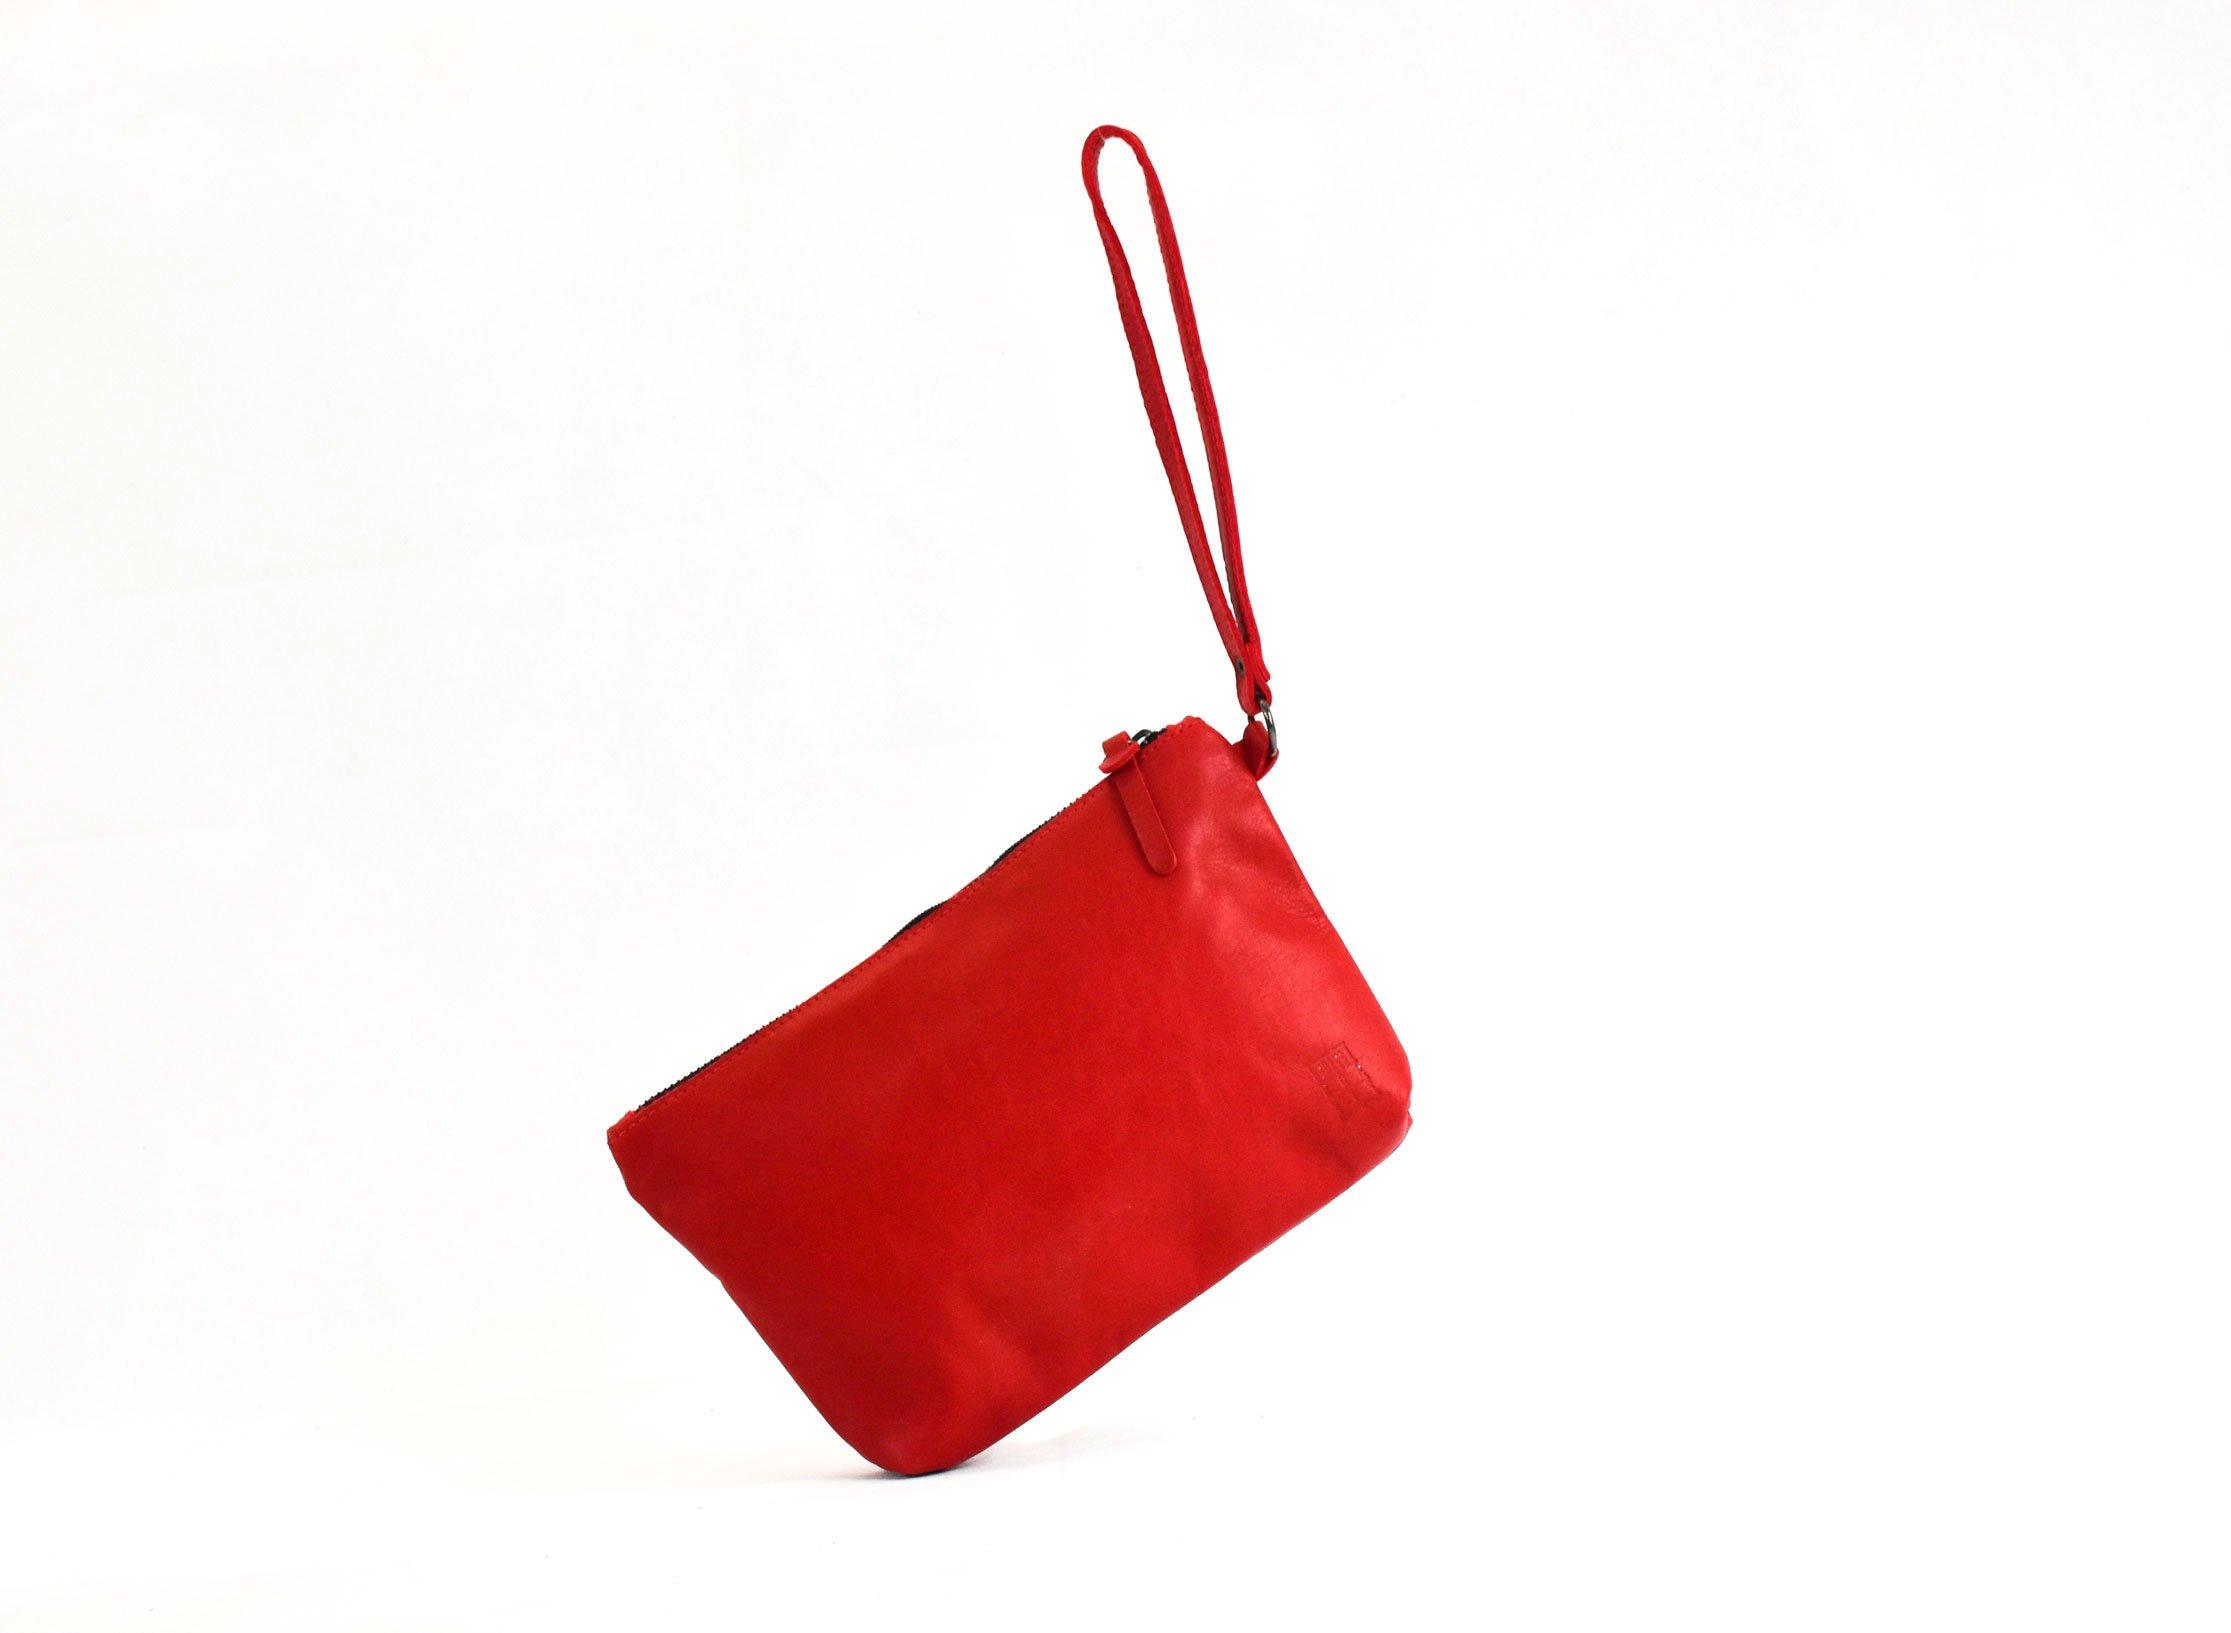 corrientes bolso de mano rojo ligero interior piel handmade barcelona custom casual unisex